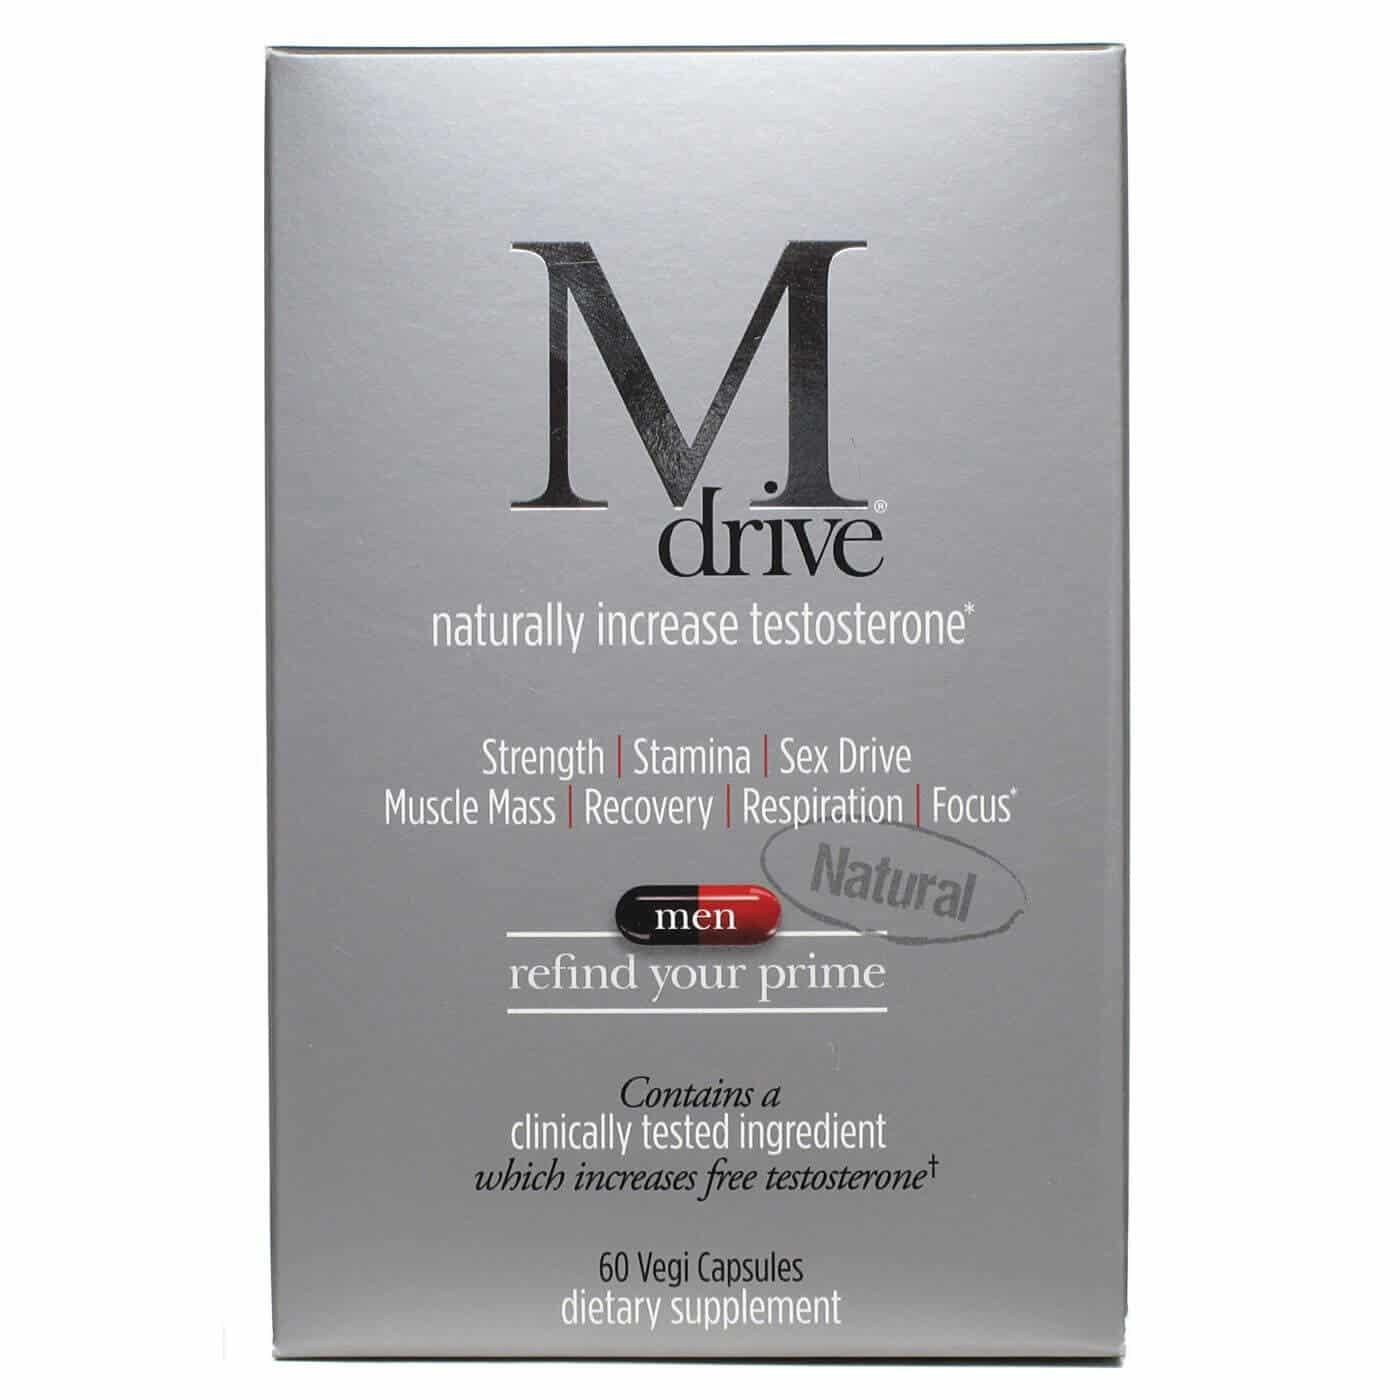 M Drive Ingredients